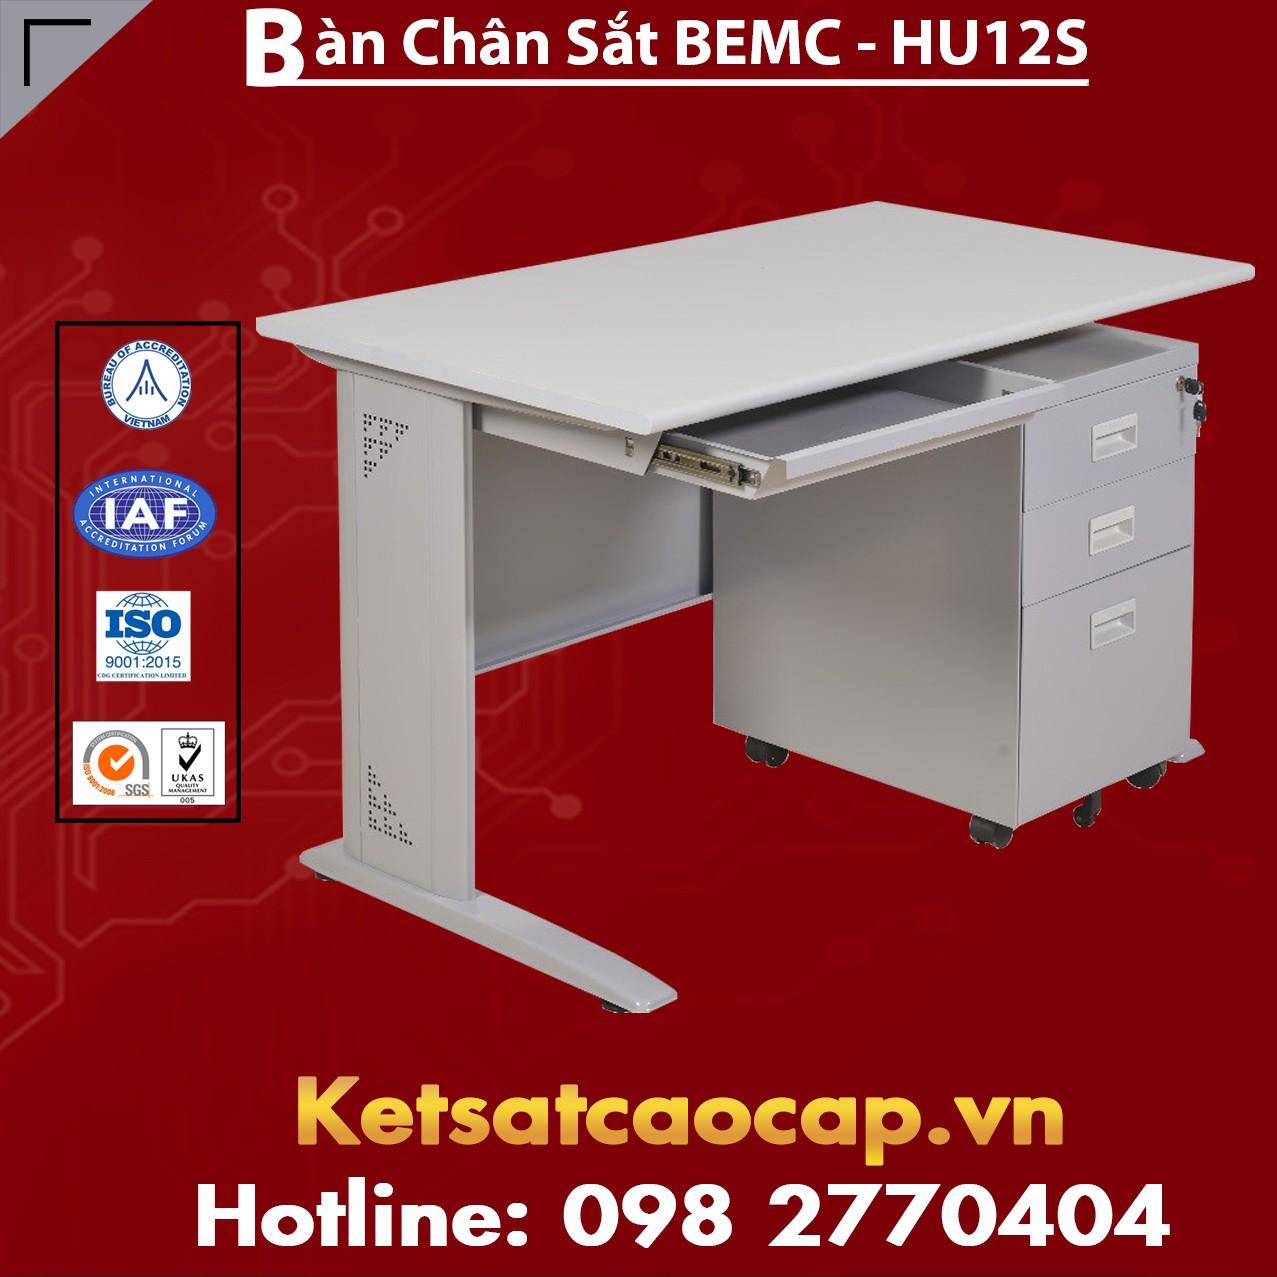 Bàn Chân Sắt BEMC - HU12S